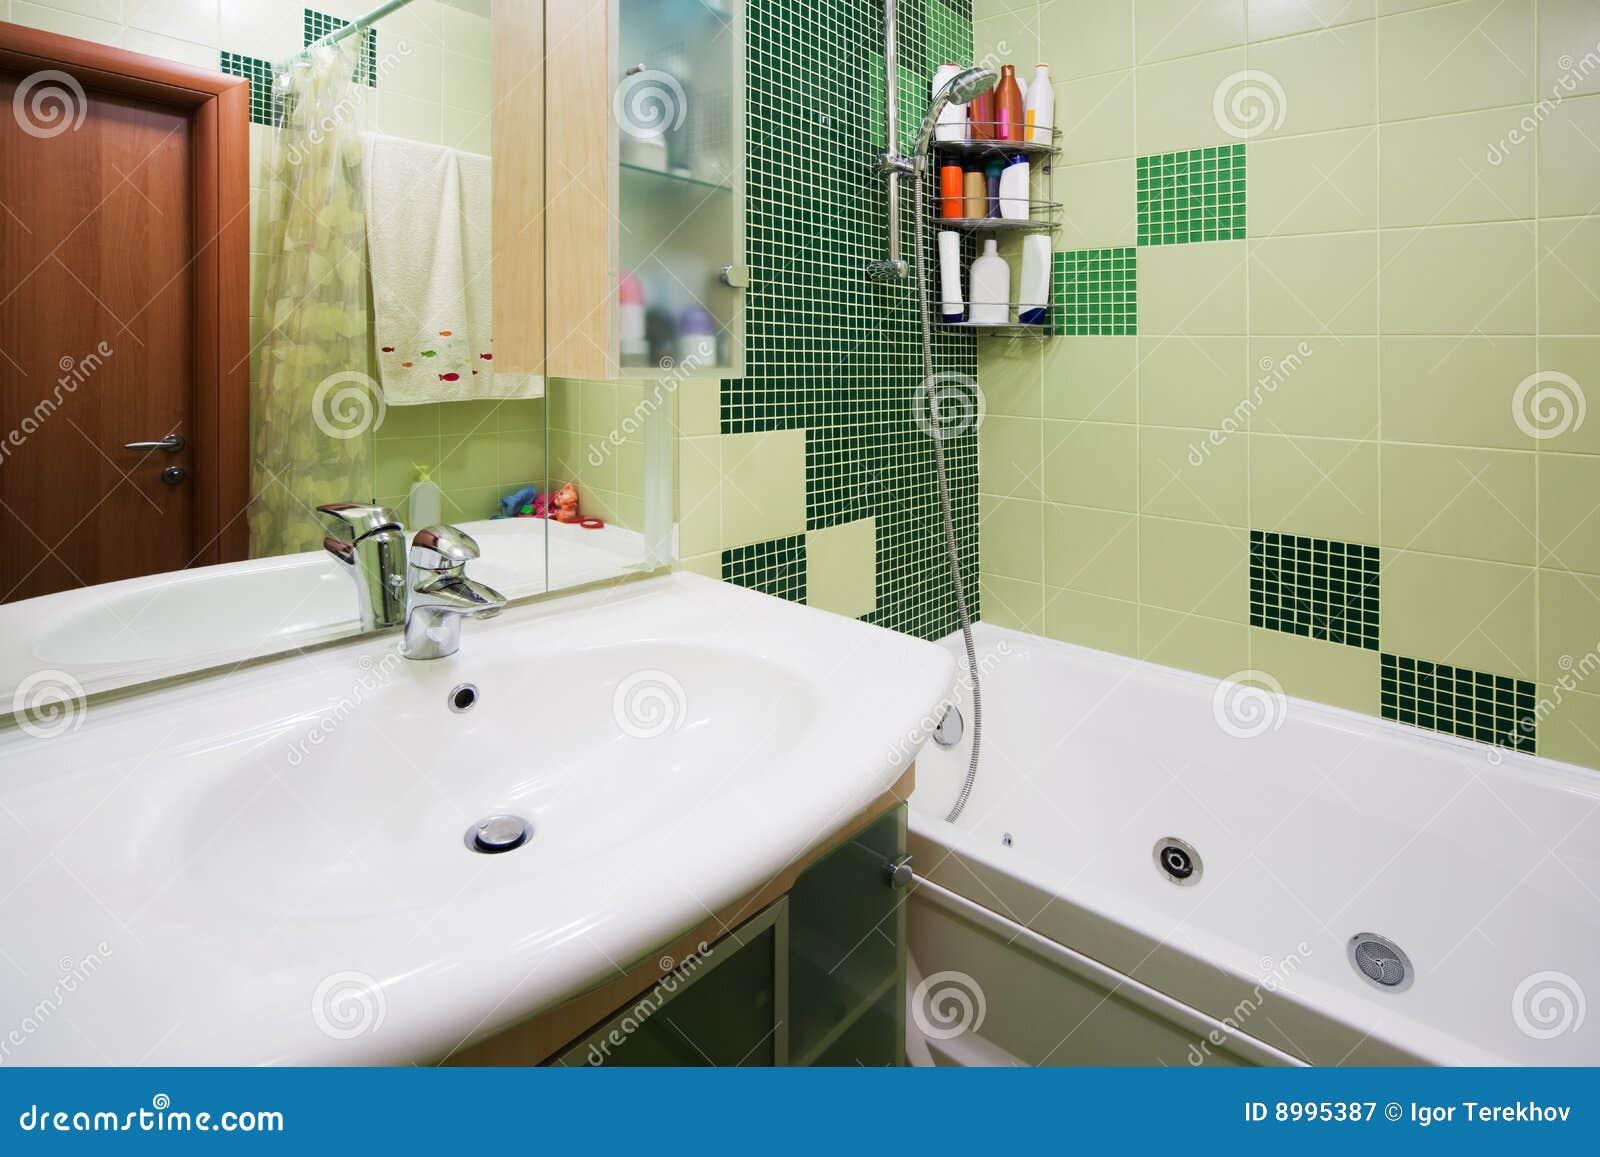 salle de bains verte image stock image du c ramique. Black Bedroom Furniture Sets. Home Design Ideas